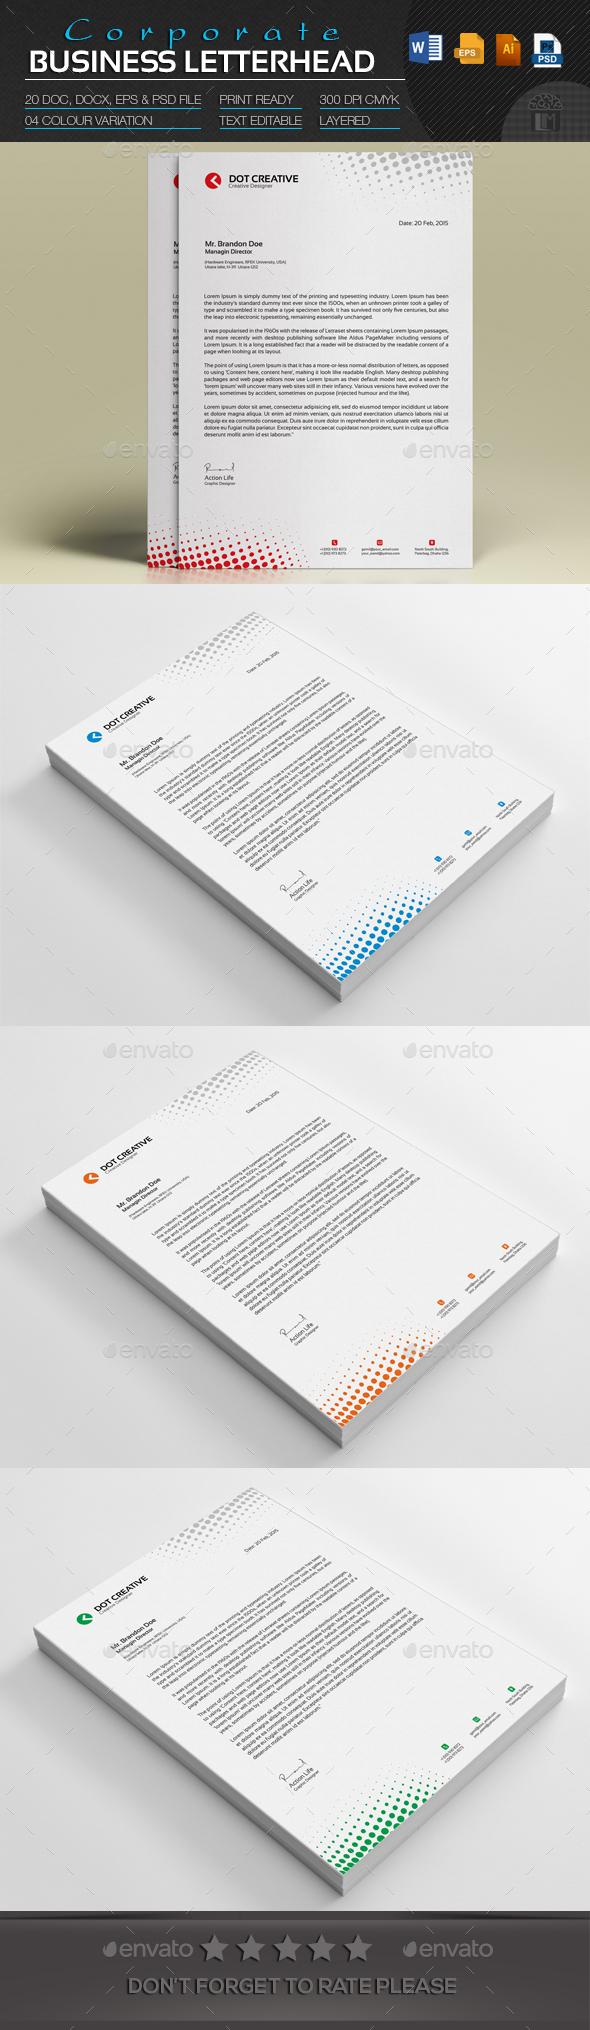 Corporate business letterhead letterhead corporate business and corporate business letterhead spiritdancerdesigns Choice Image